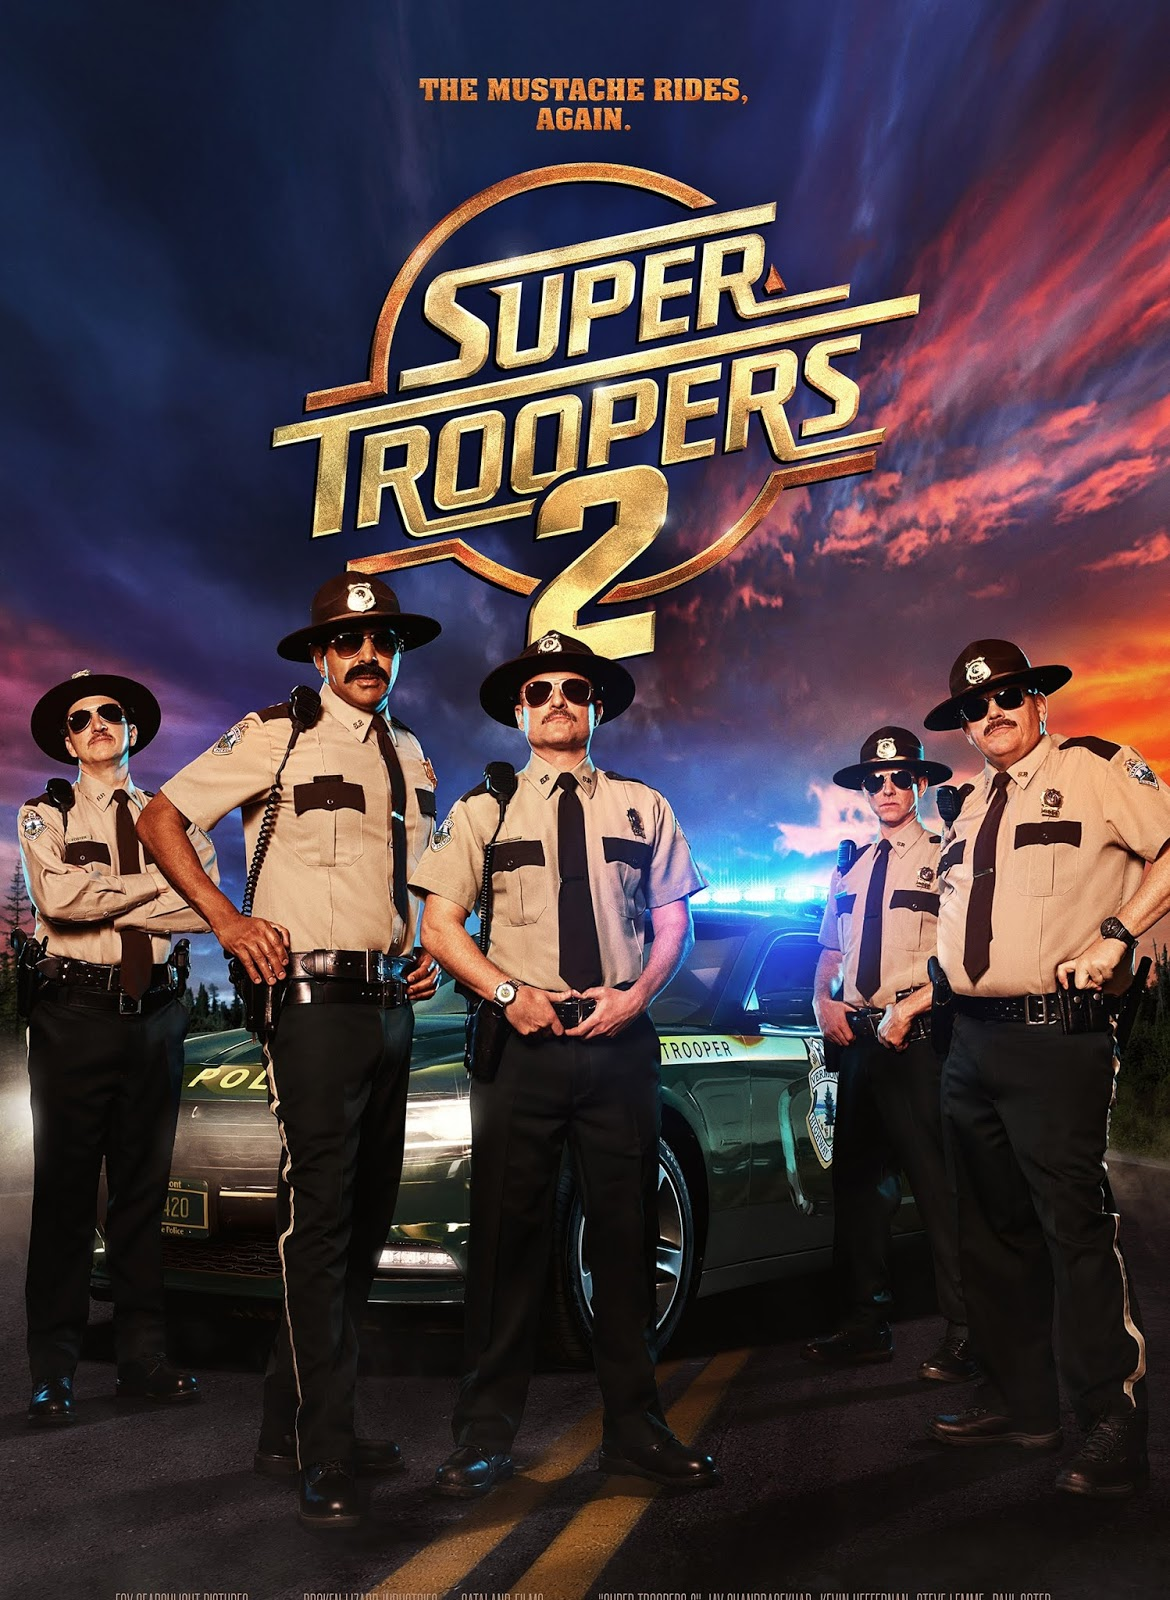 Super Troopers 2 [2018] [DVDR] [NTSC] [CUSTOM HD] [Latino]